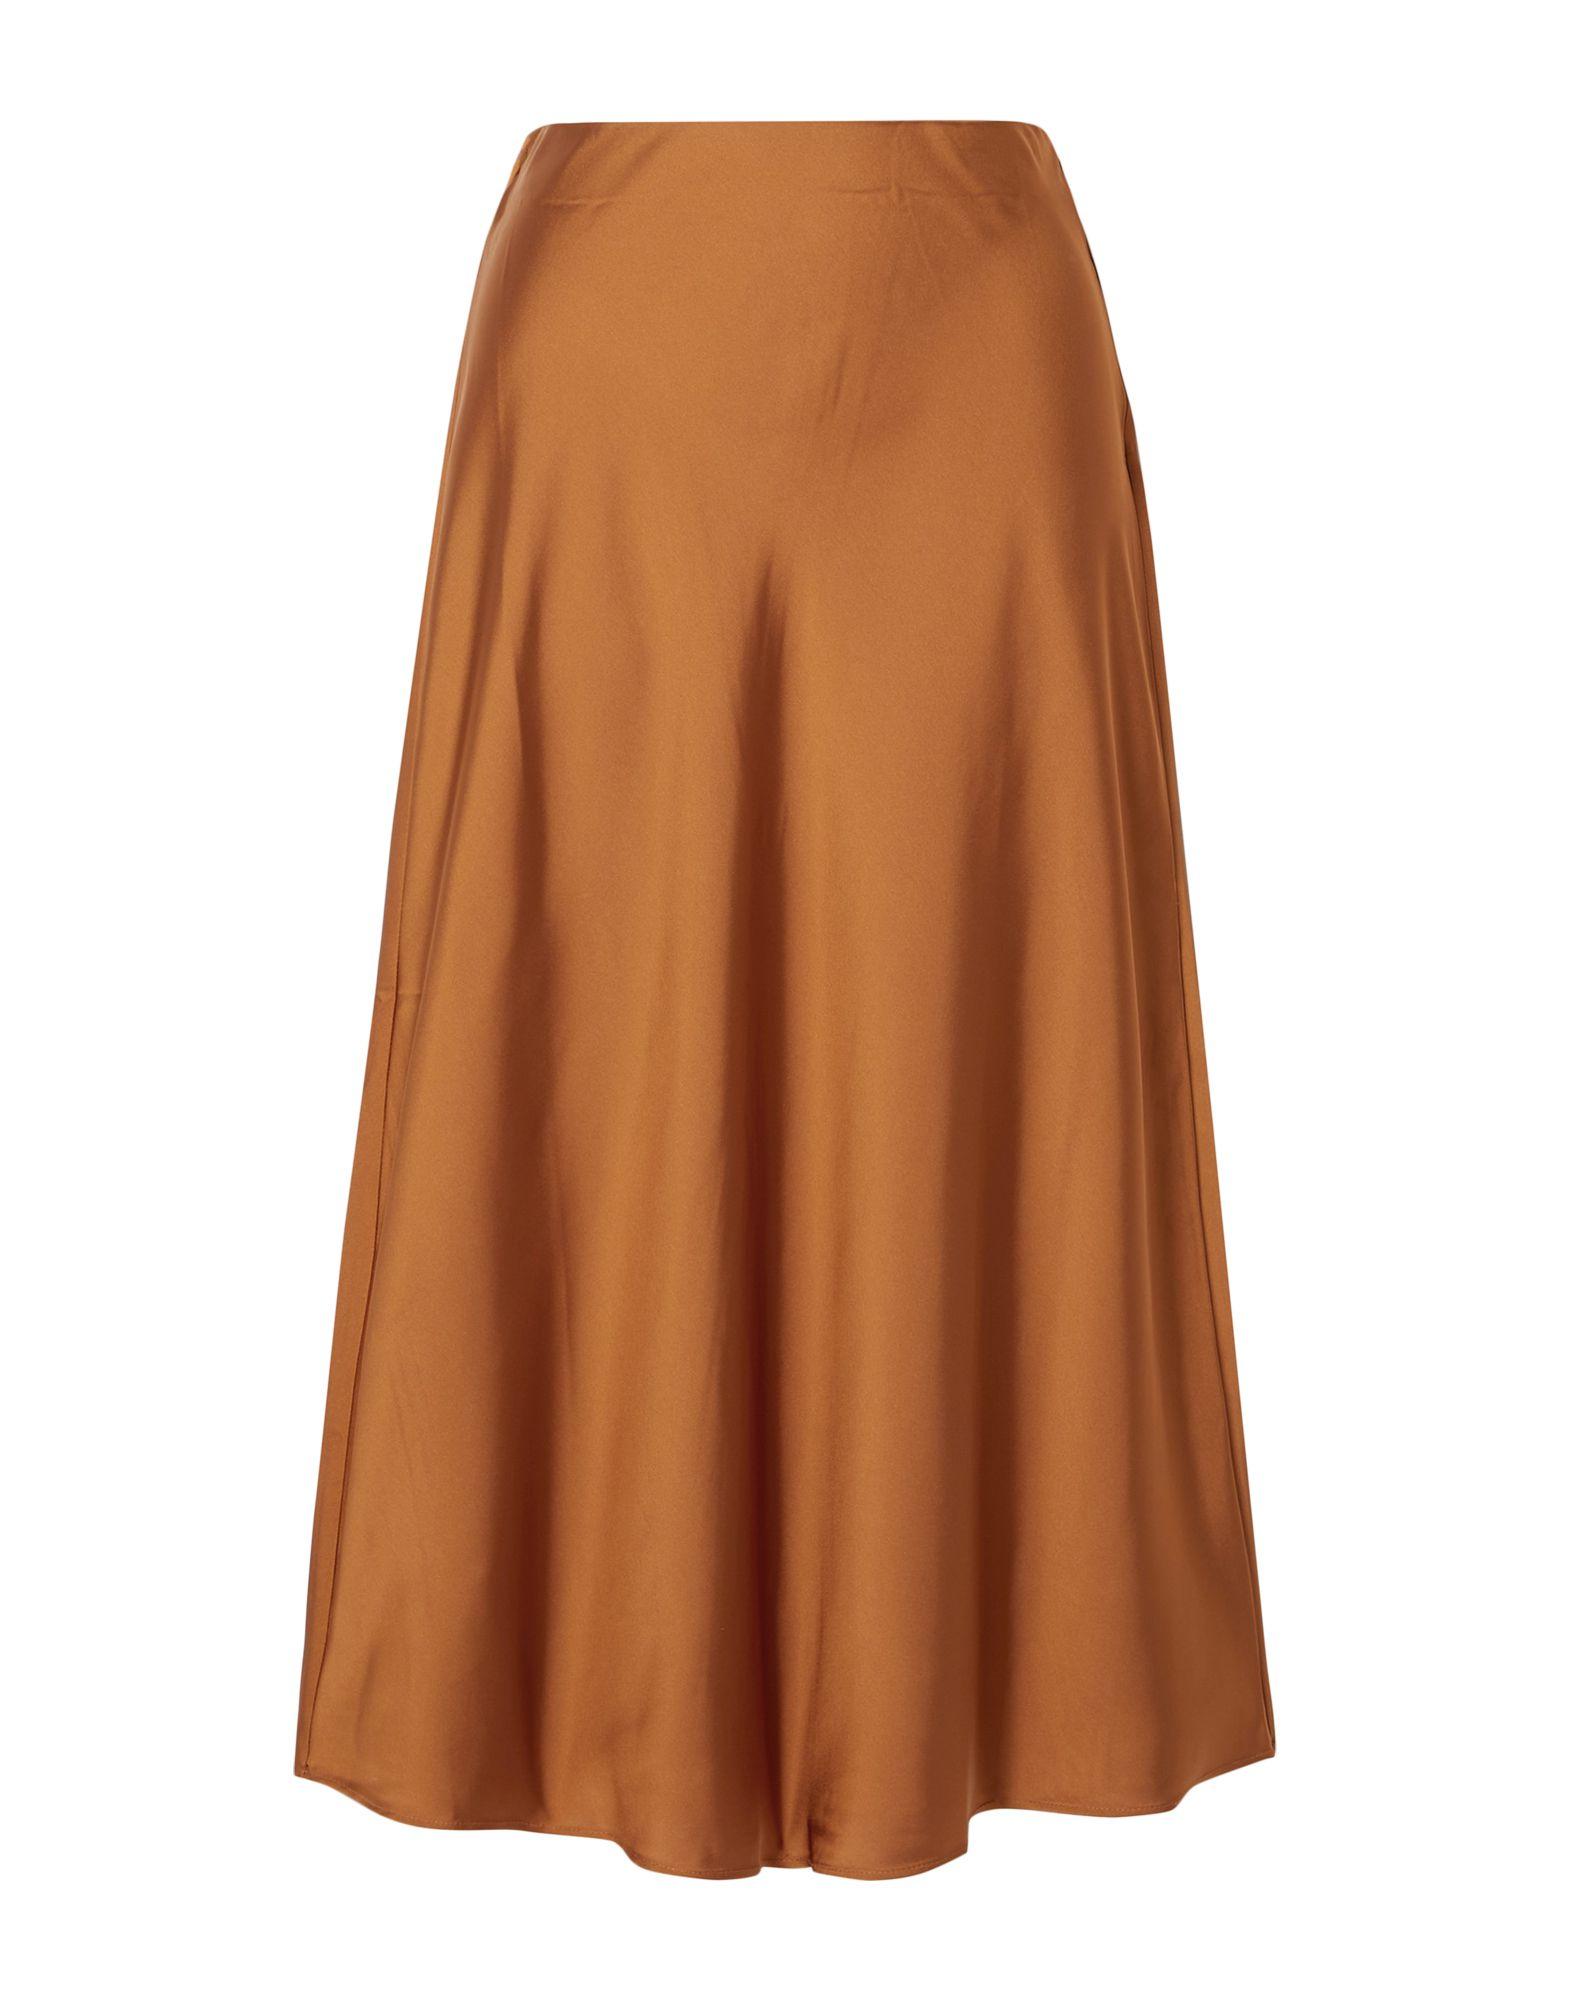 J.CREW 3/4 length skirts. unlined, crepe, no appliqués, solid color, elasticized waist, no pockets. 100% Polyester